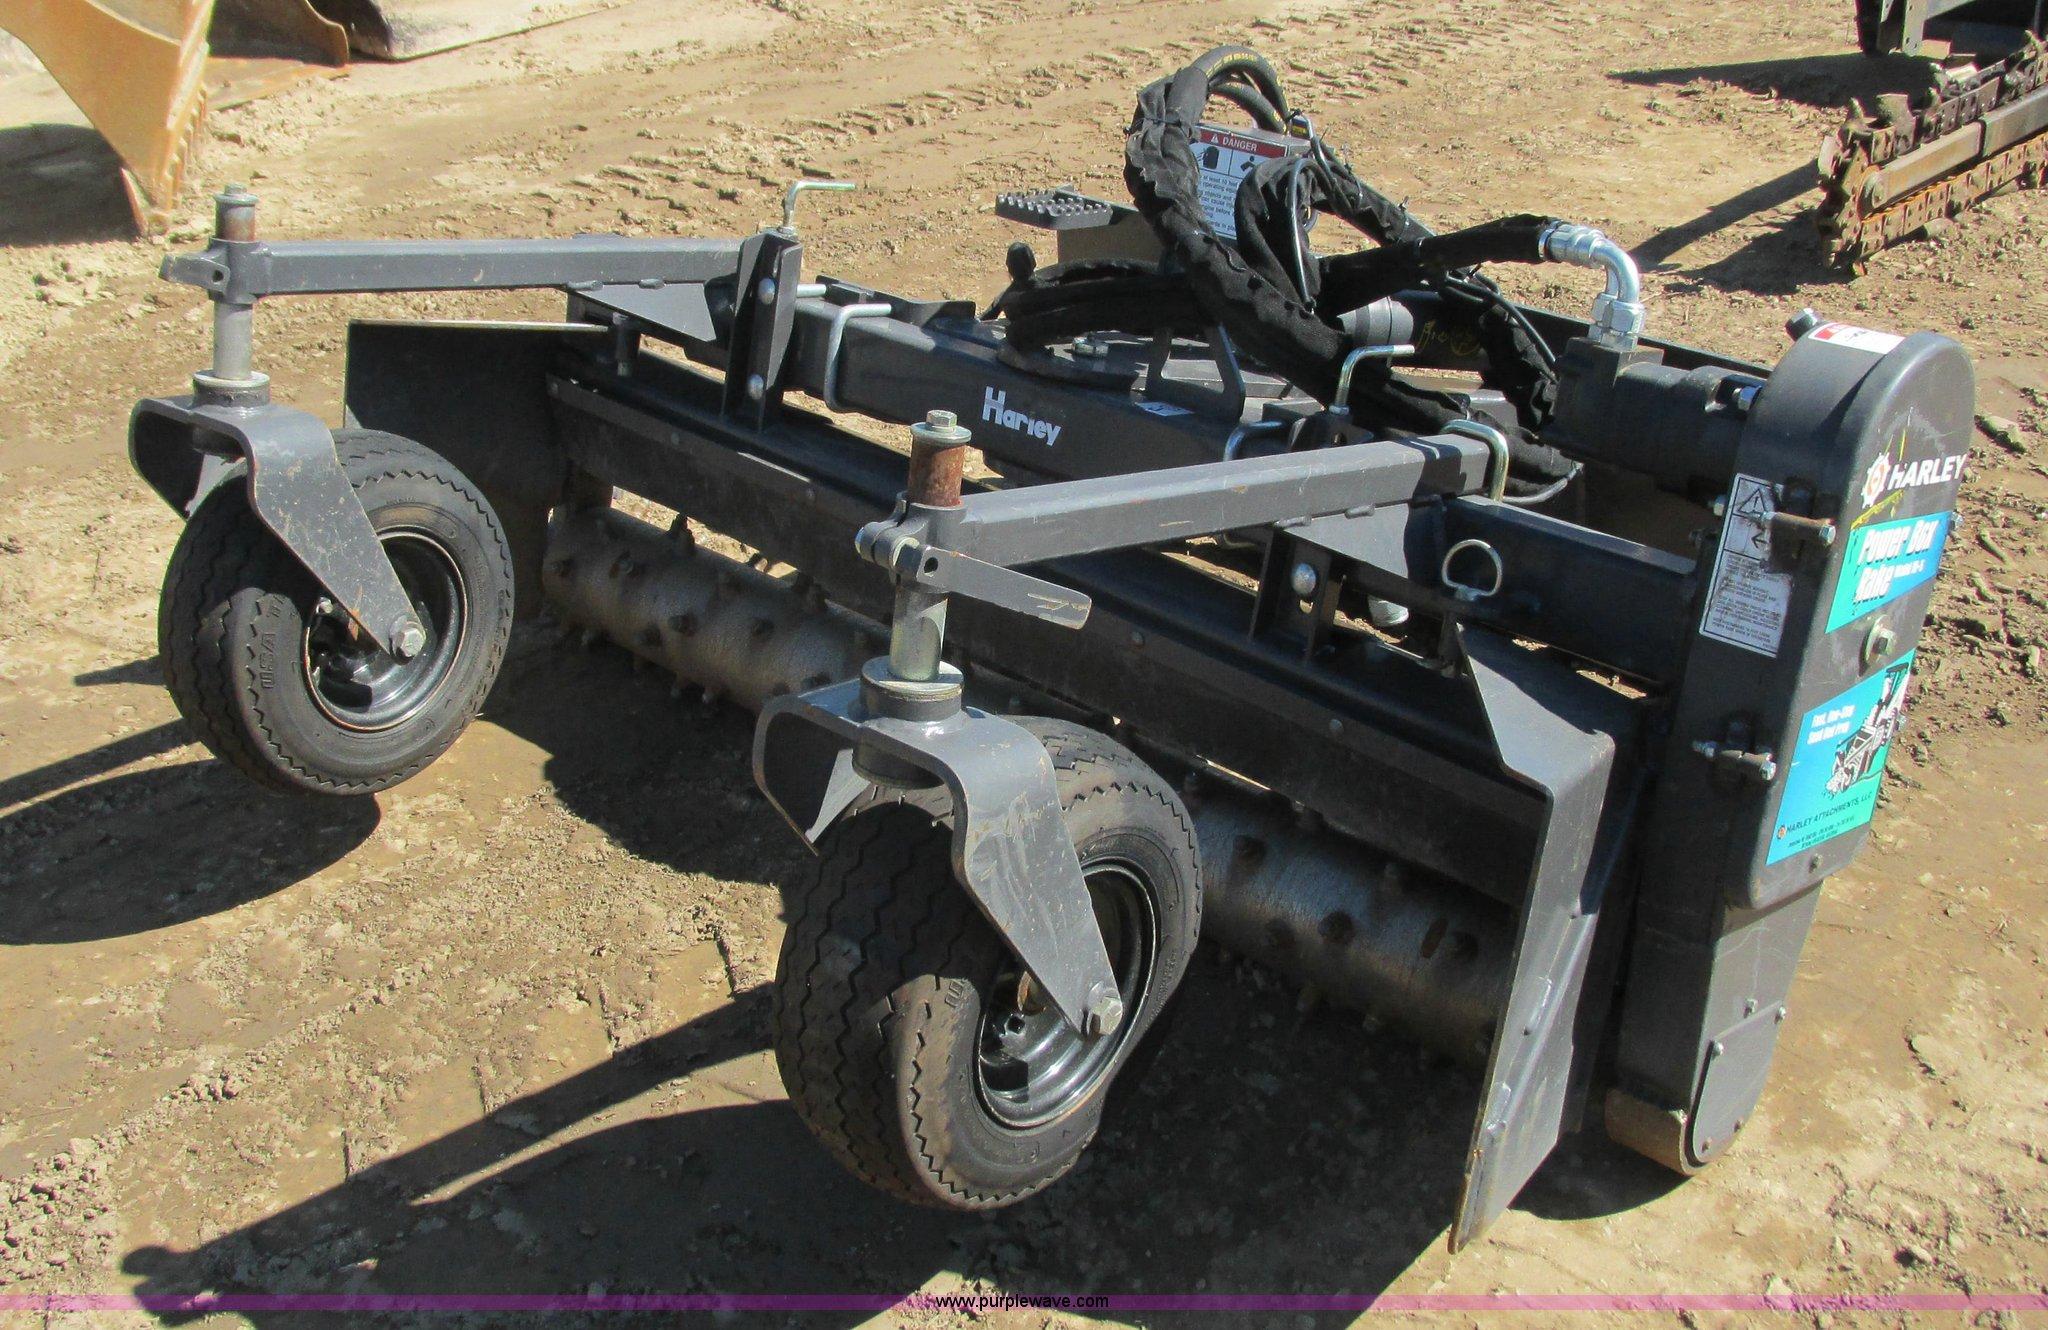 Harley M-54 soil conditioner skid steer attachment | Item K6